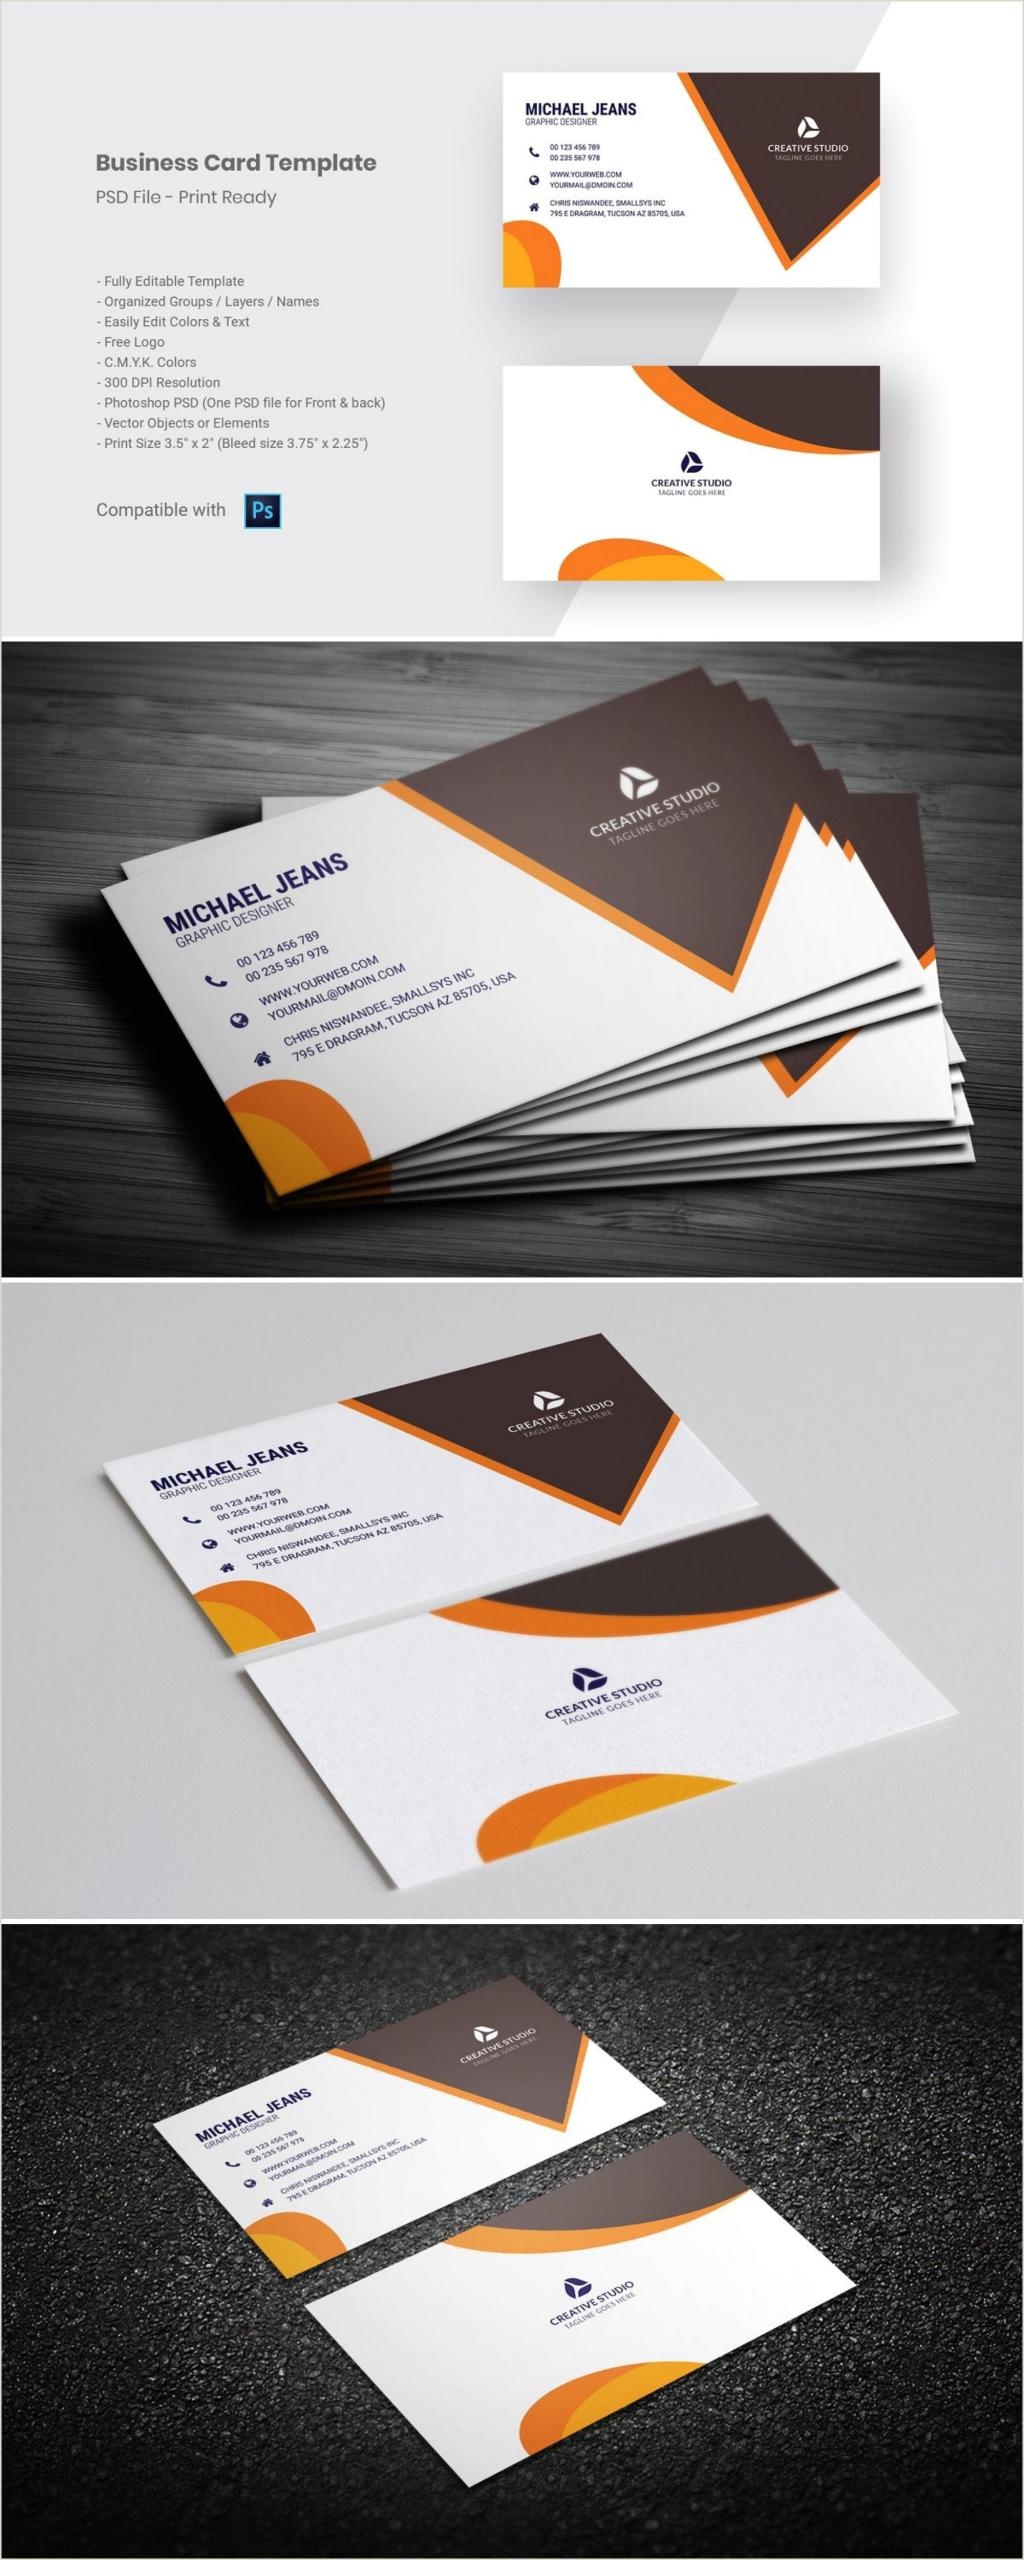 Best Business Cards Credit Employee Modern Business Card Template